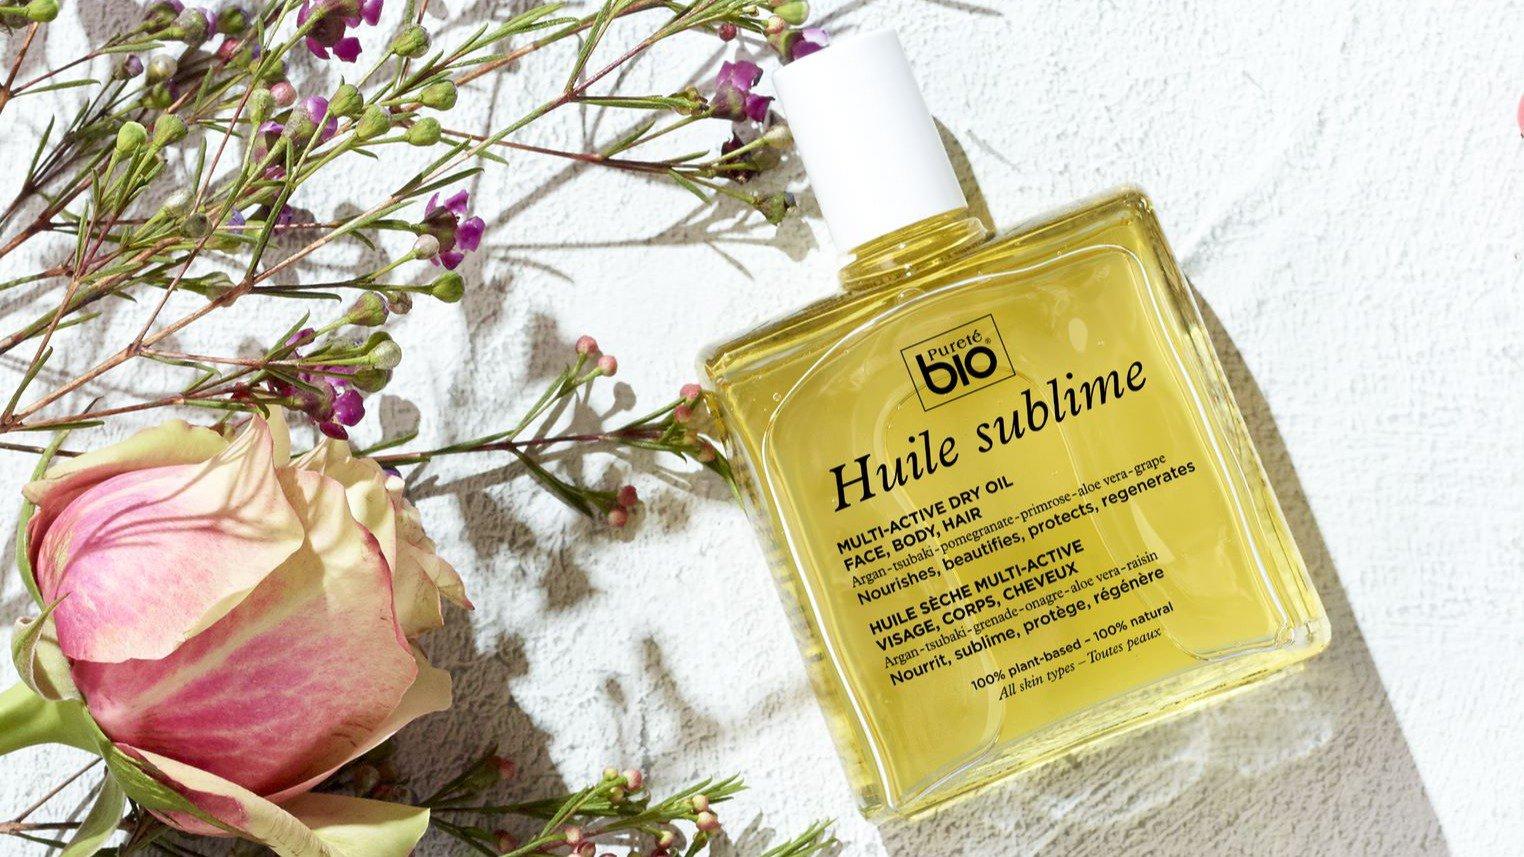 Huile Sublime, perfect cadeau voor moederdag